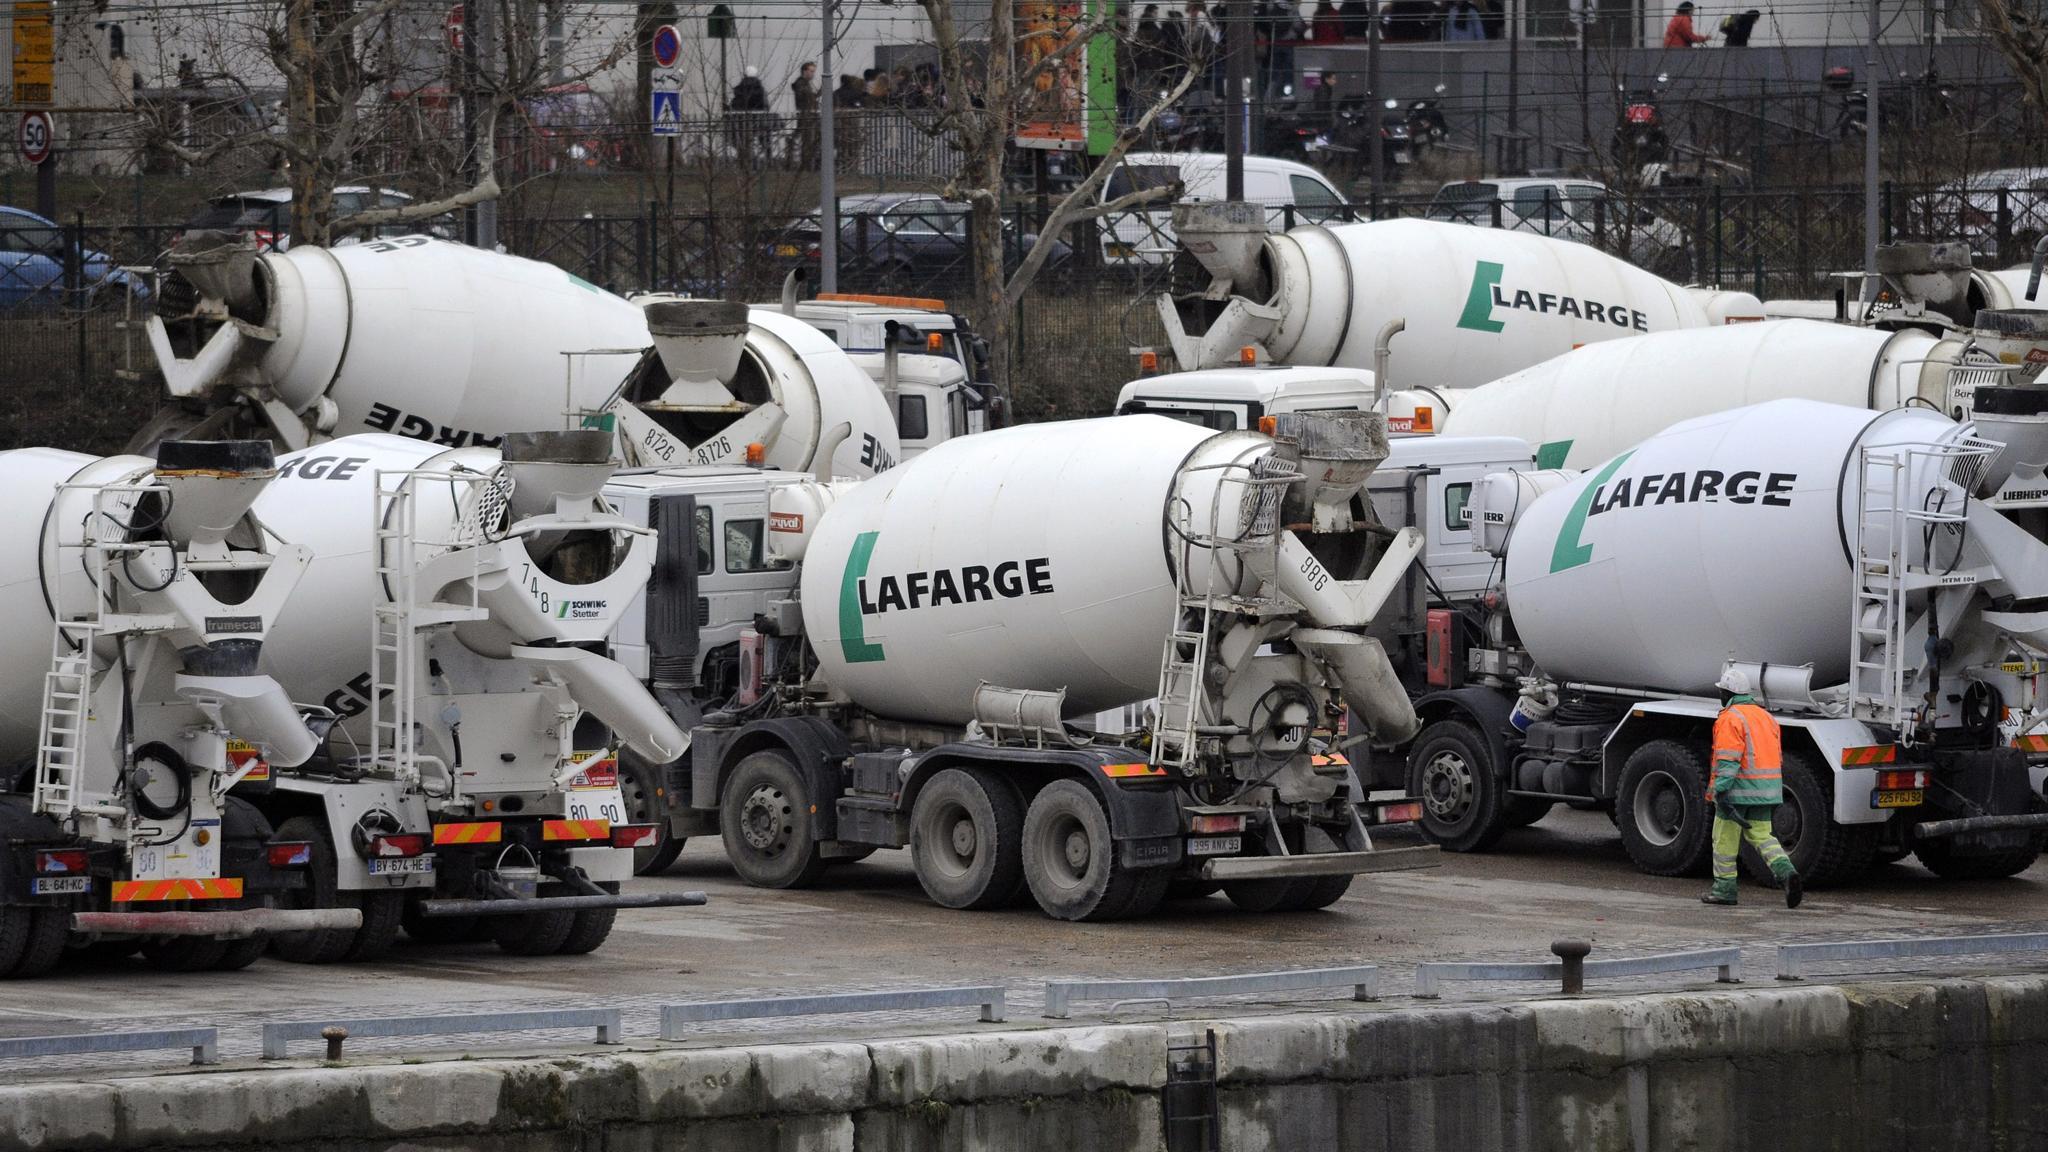 New Lafarge Cem : Regulators must get harder on holcim and lafarge deal